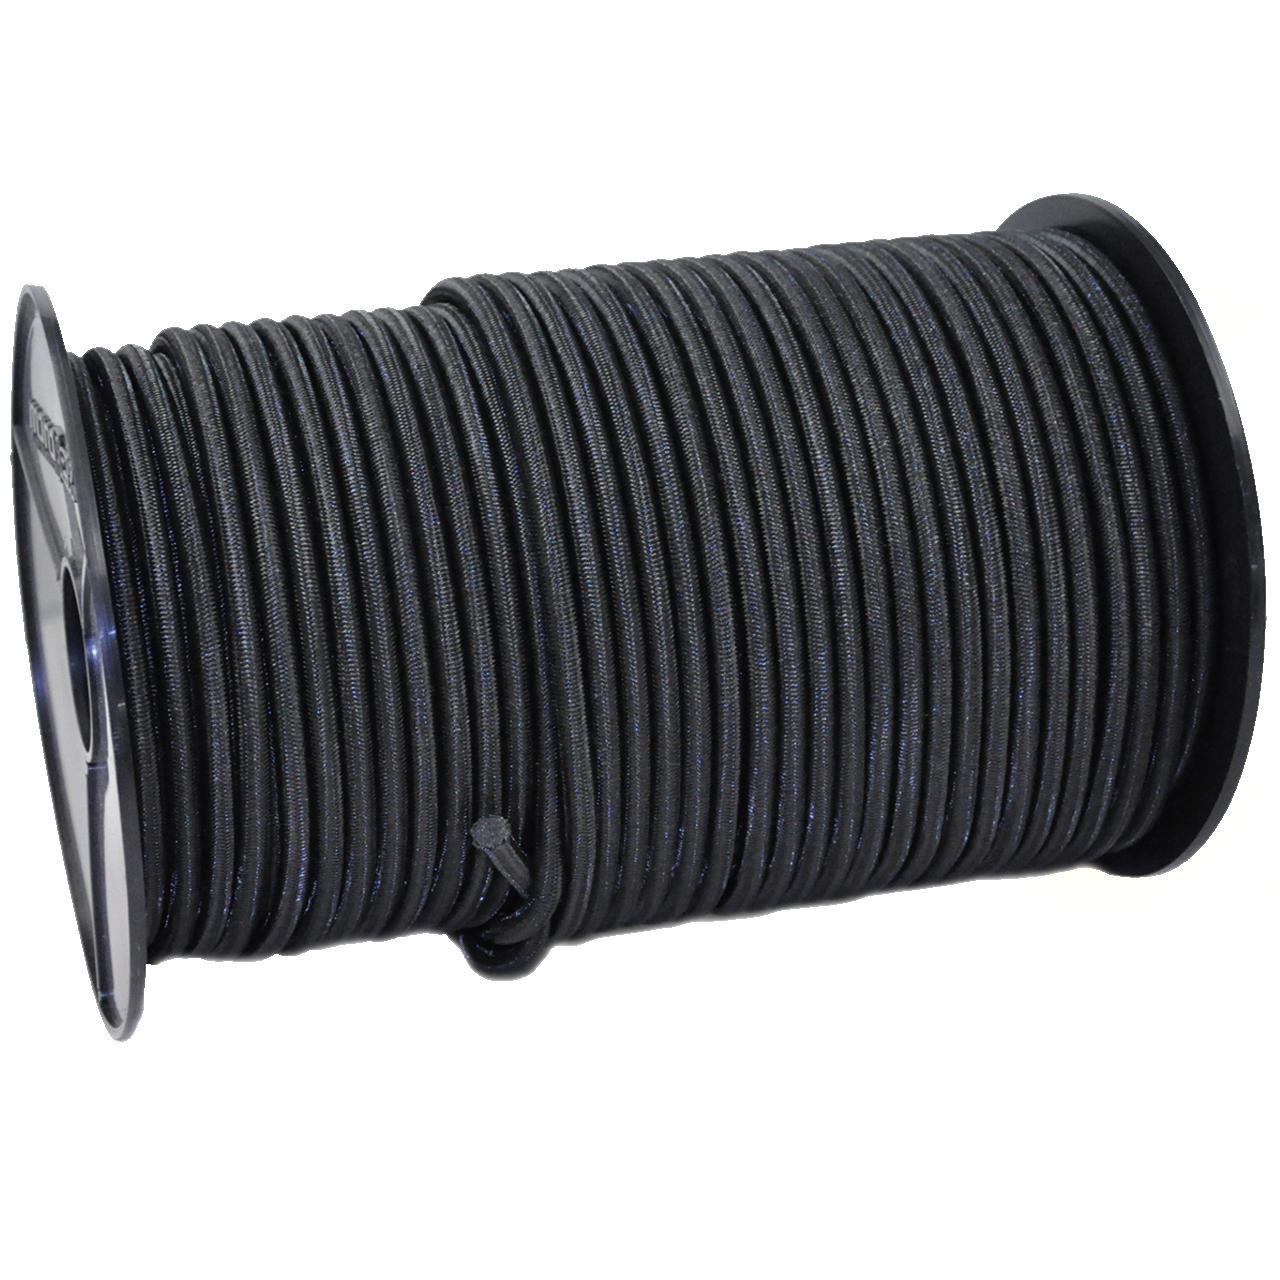 SCHNURHAUS - Monoflex Expanderseil mit Polyethylen (PE) Mantel schwarz